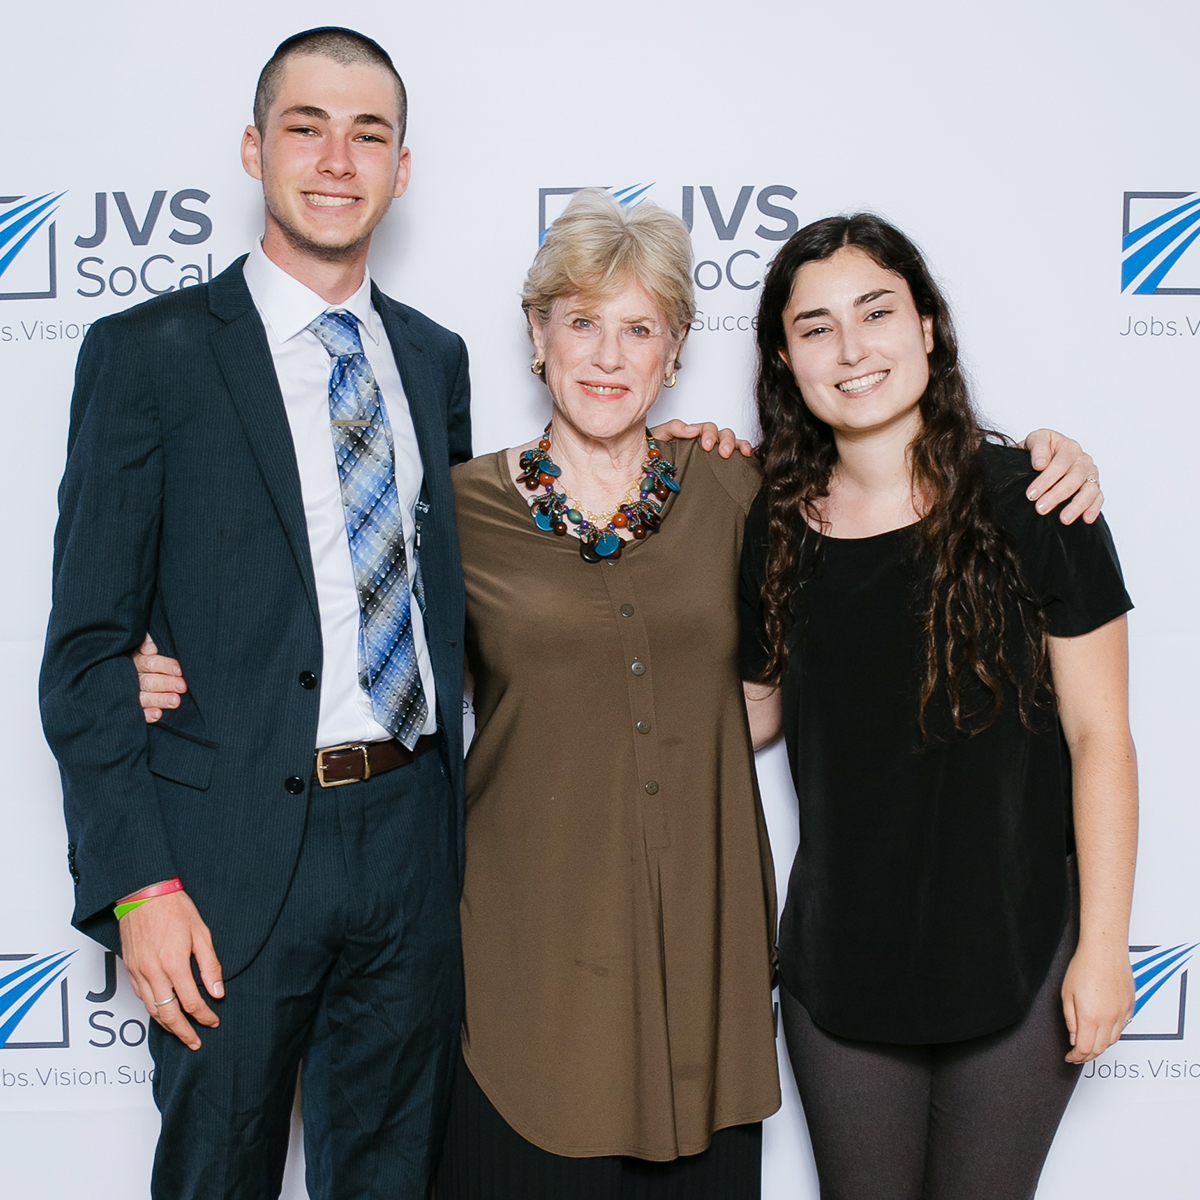 JVS-Scholarship-2019-Gallery-9